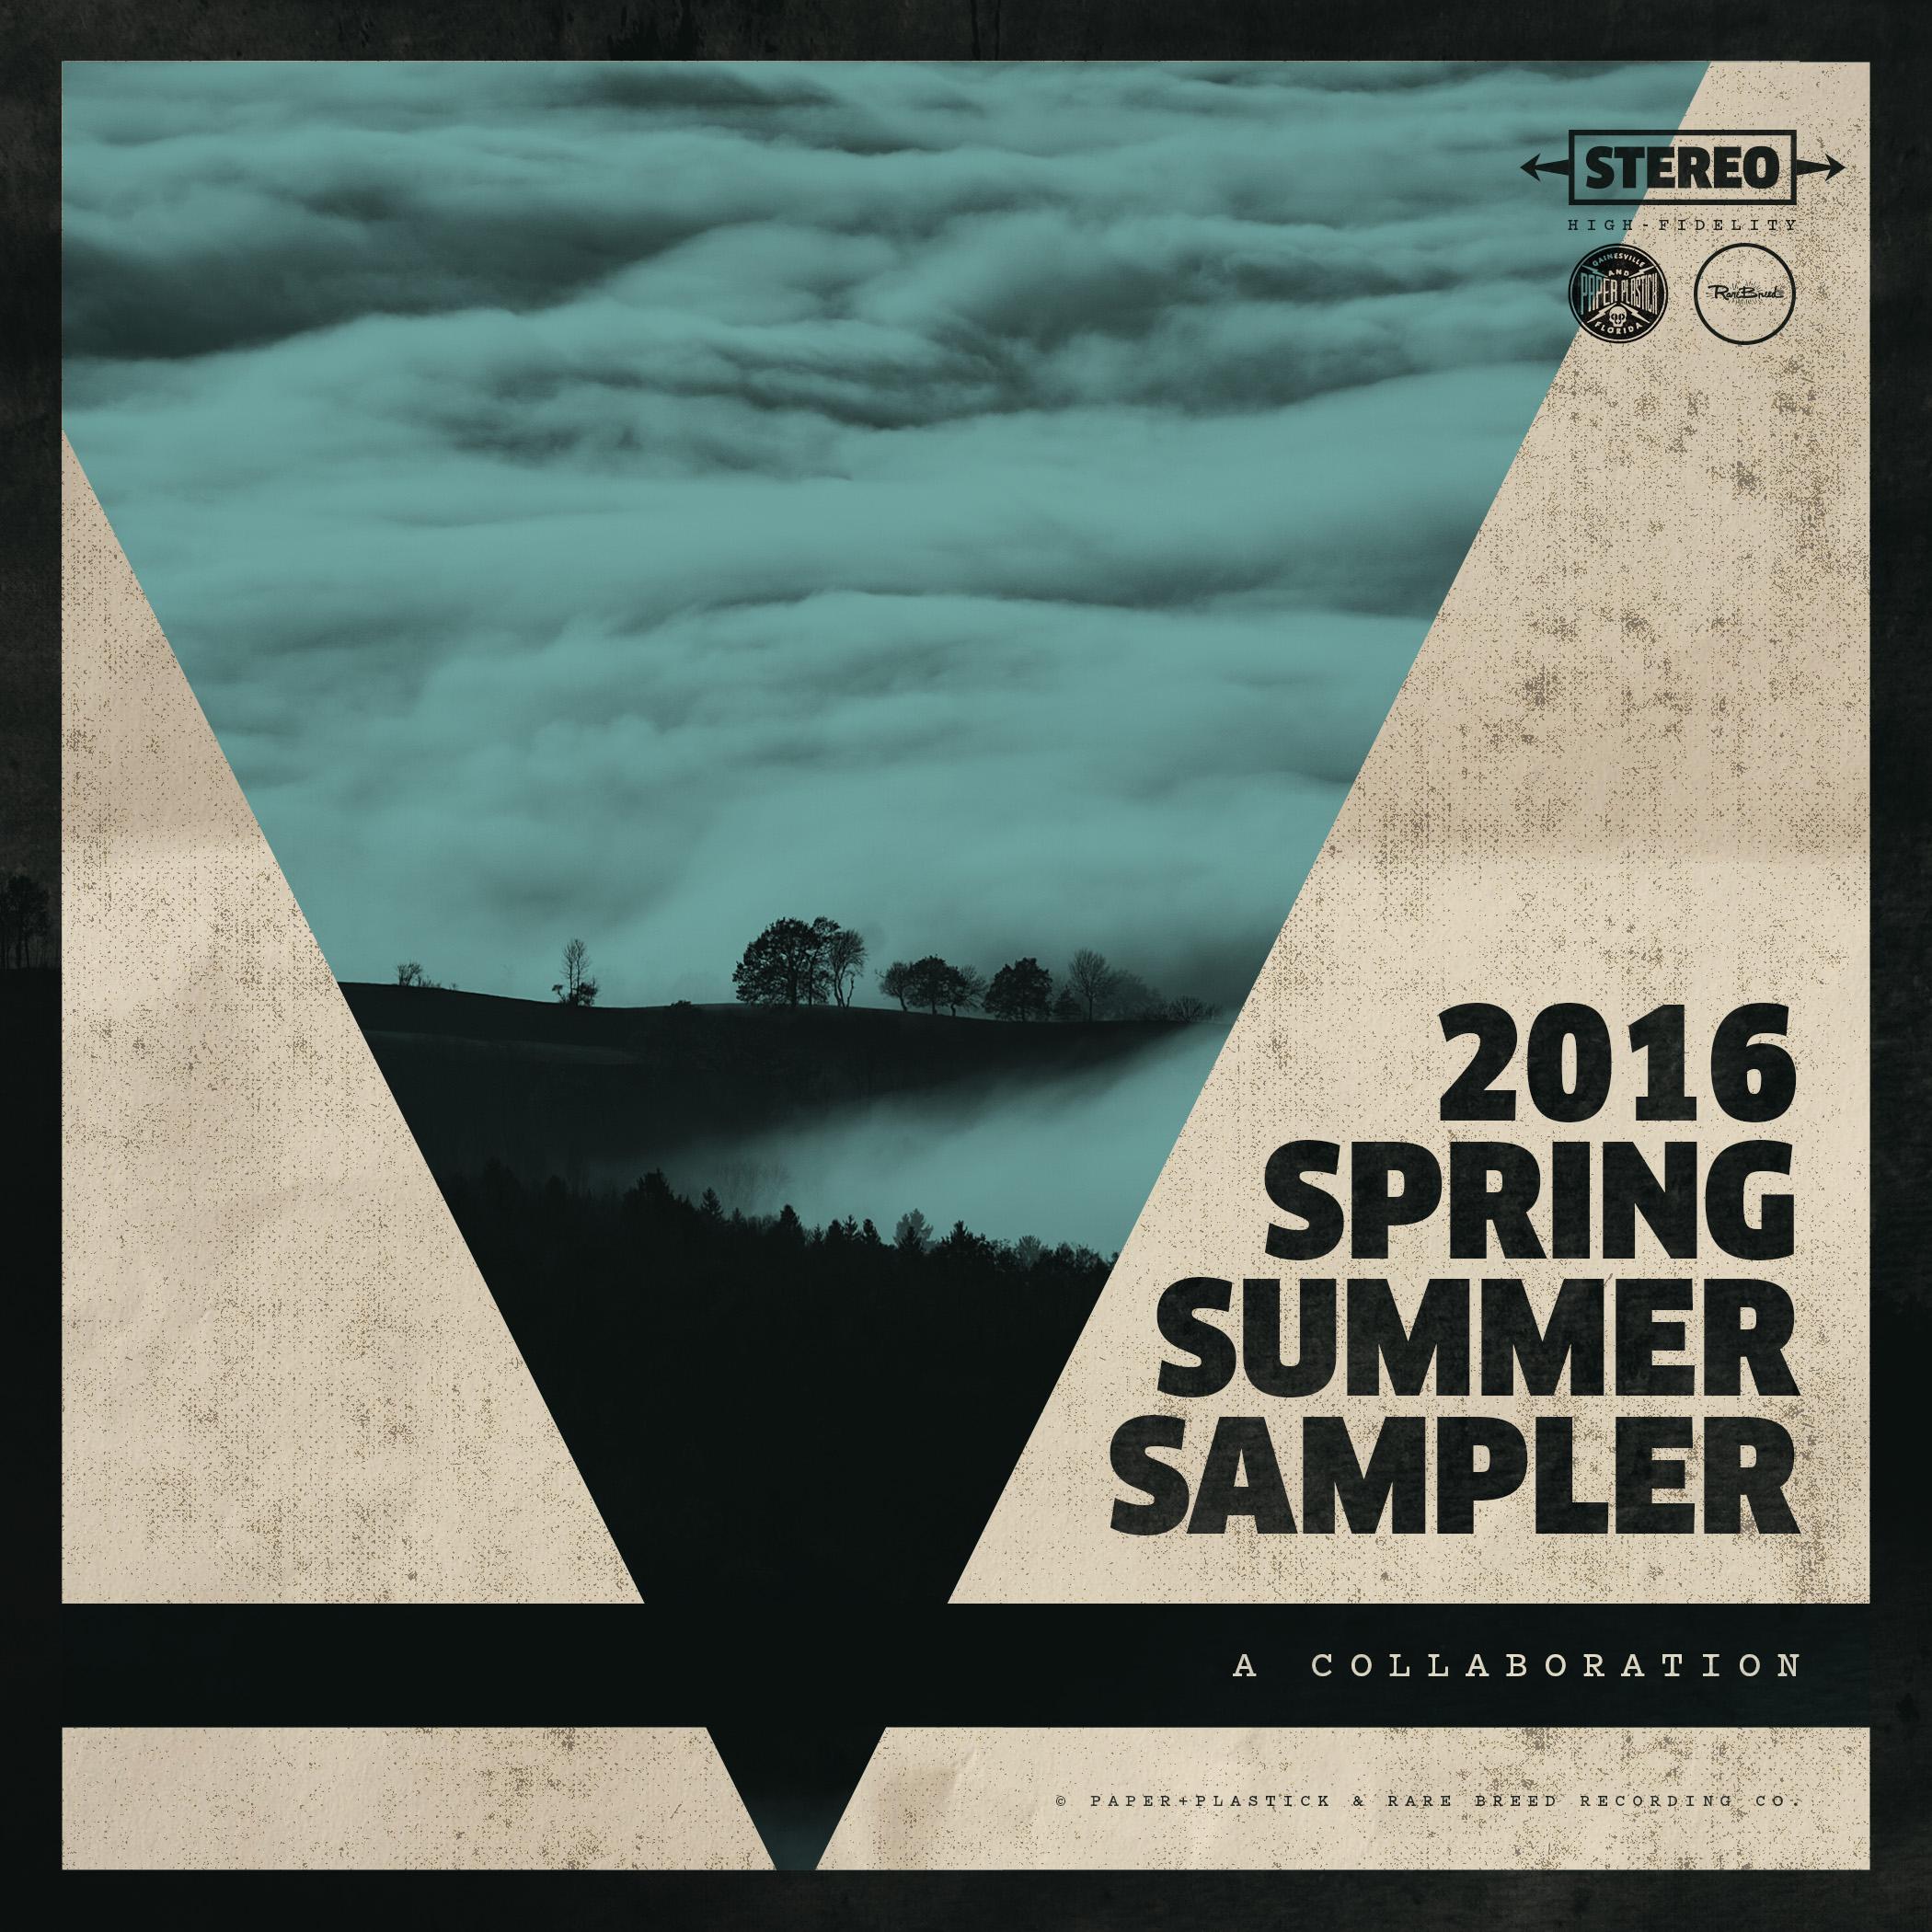 Paper + Plastick / Rare Breed Recording Co. Spring/Summer 2016 Sampler